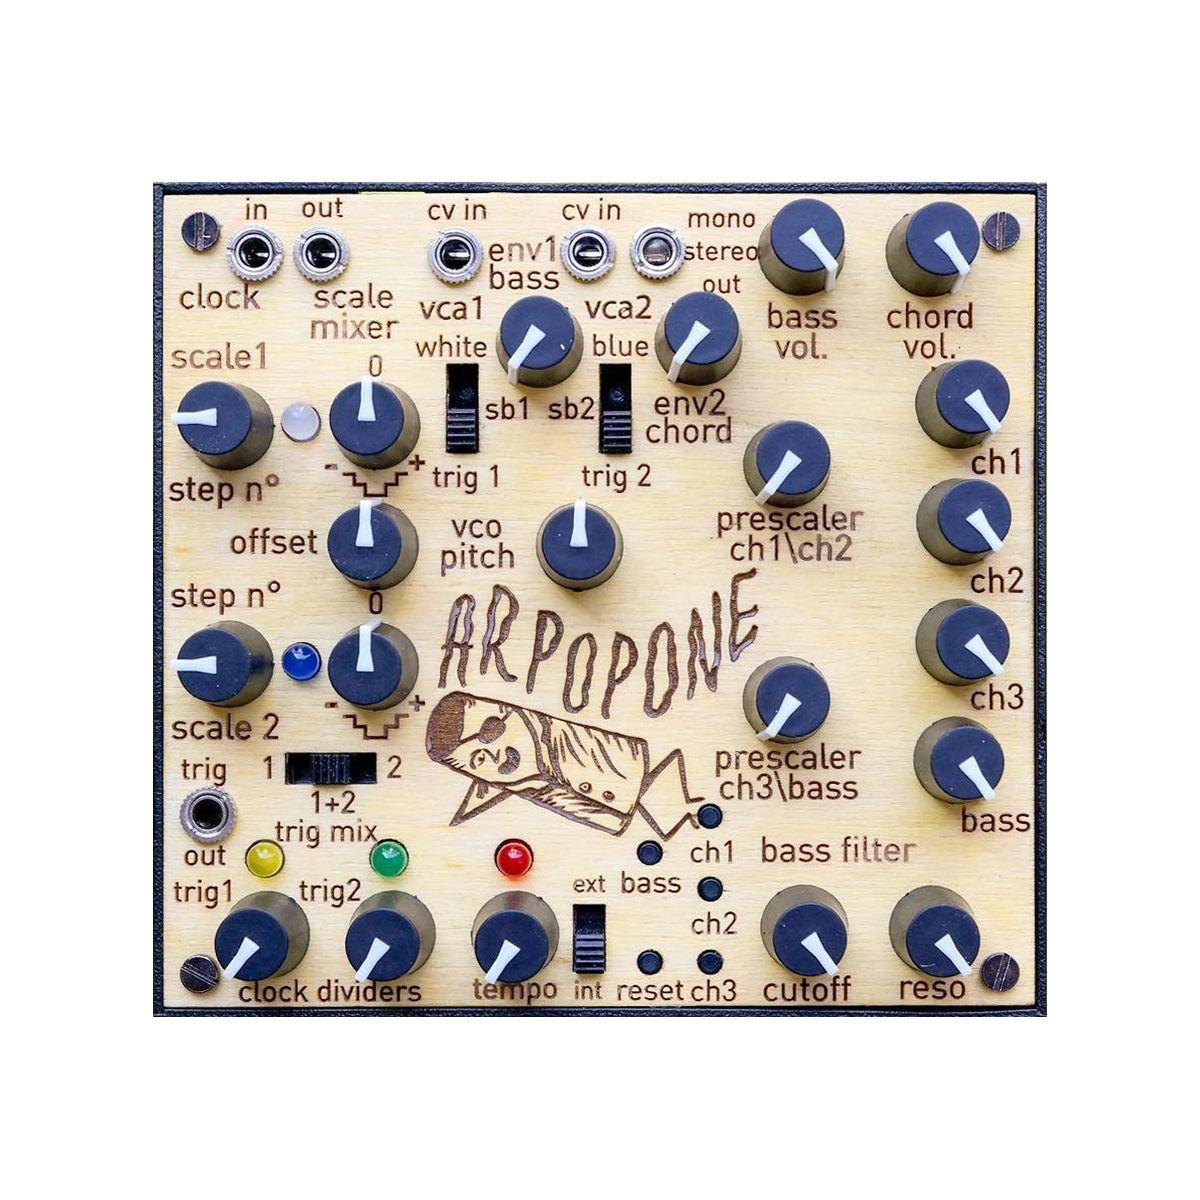 LEP Arpopone Desktop Analogue Bass Synth